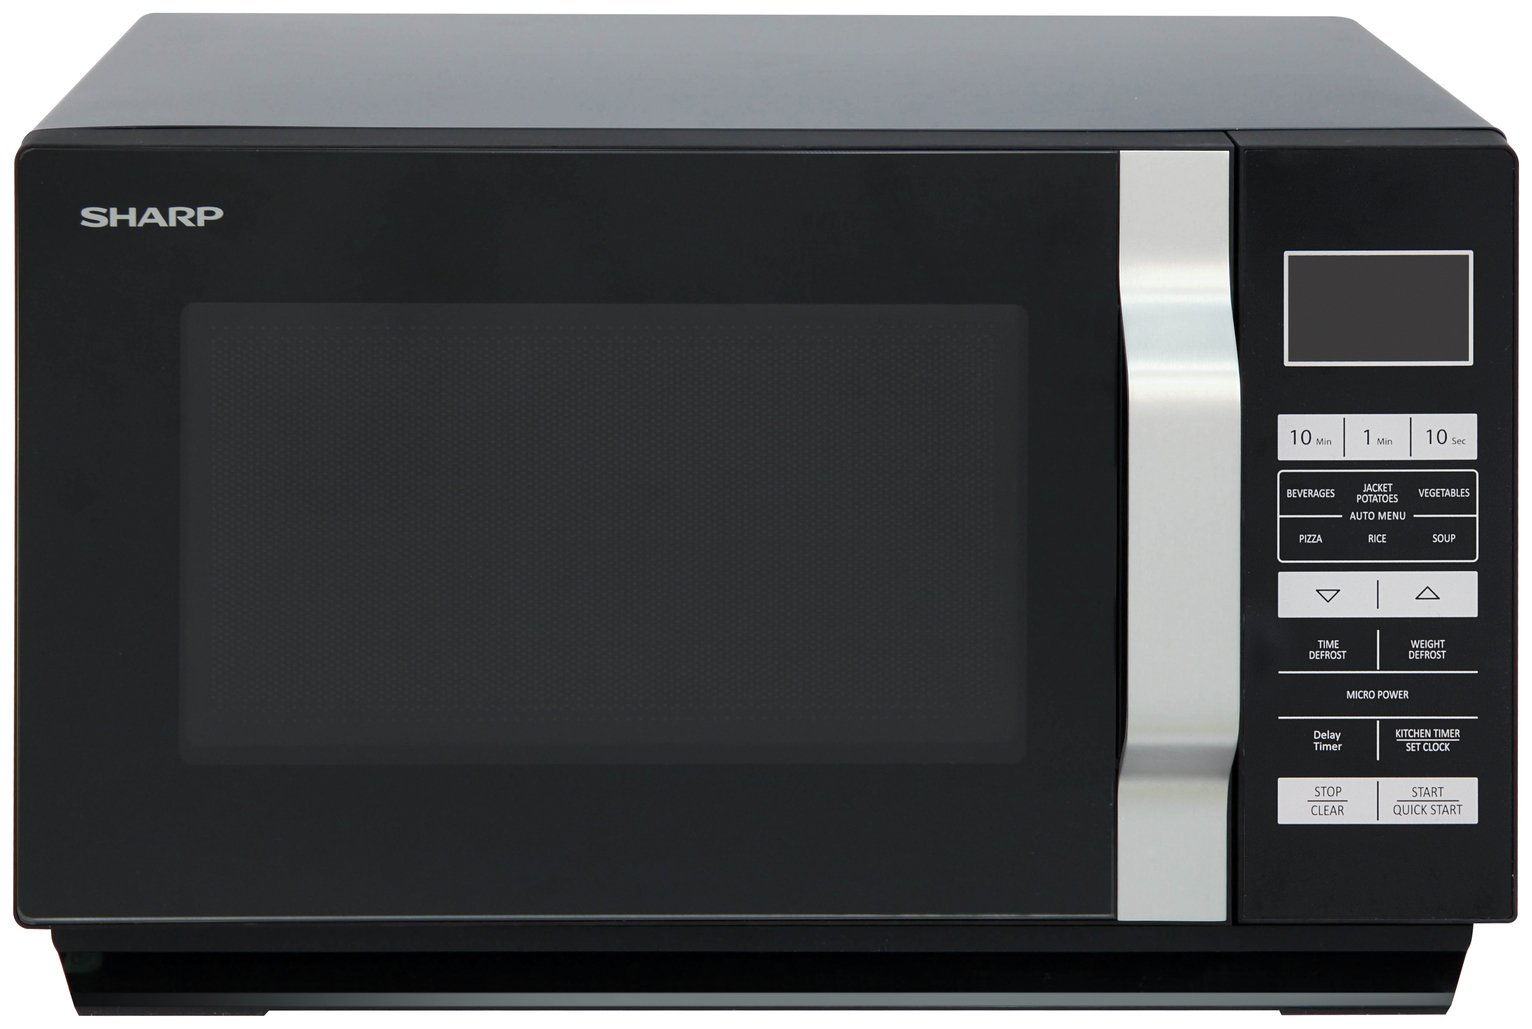 Sharp 900W Standard Microwave R360KM - Black